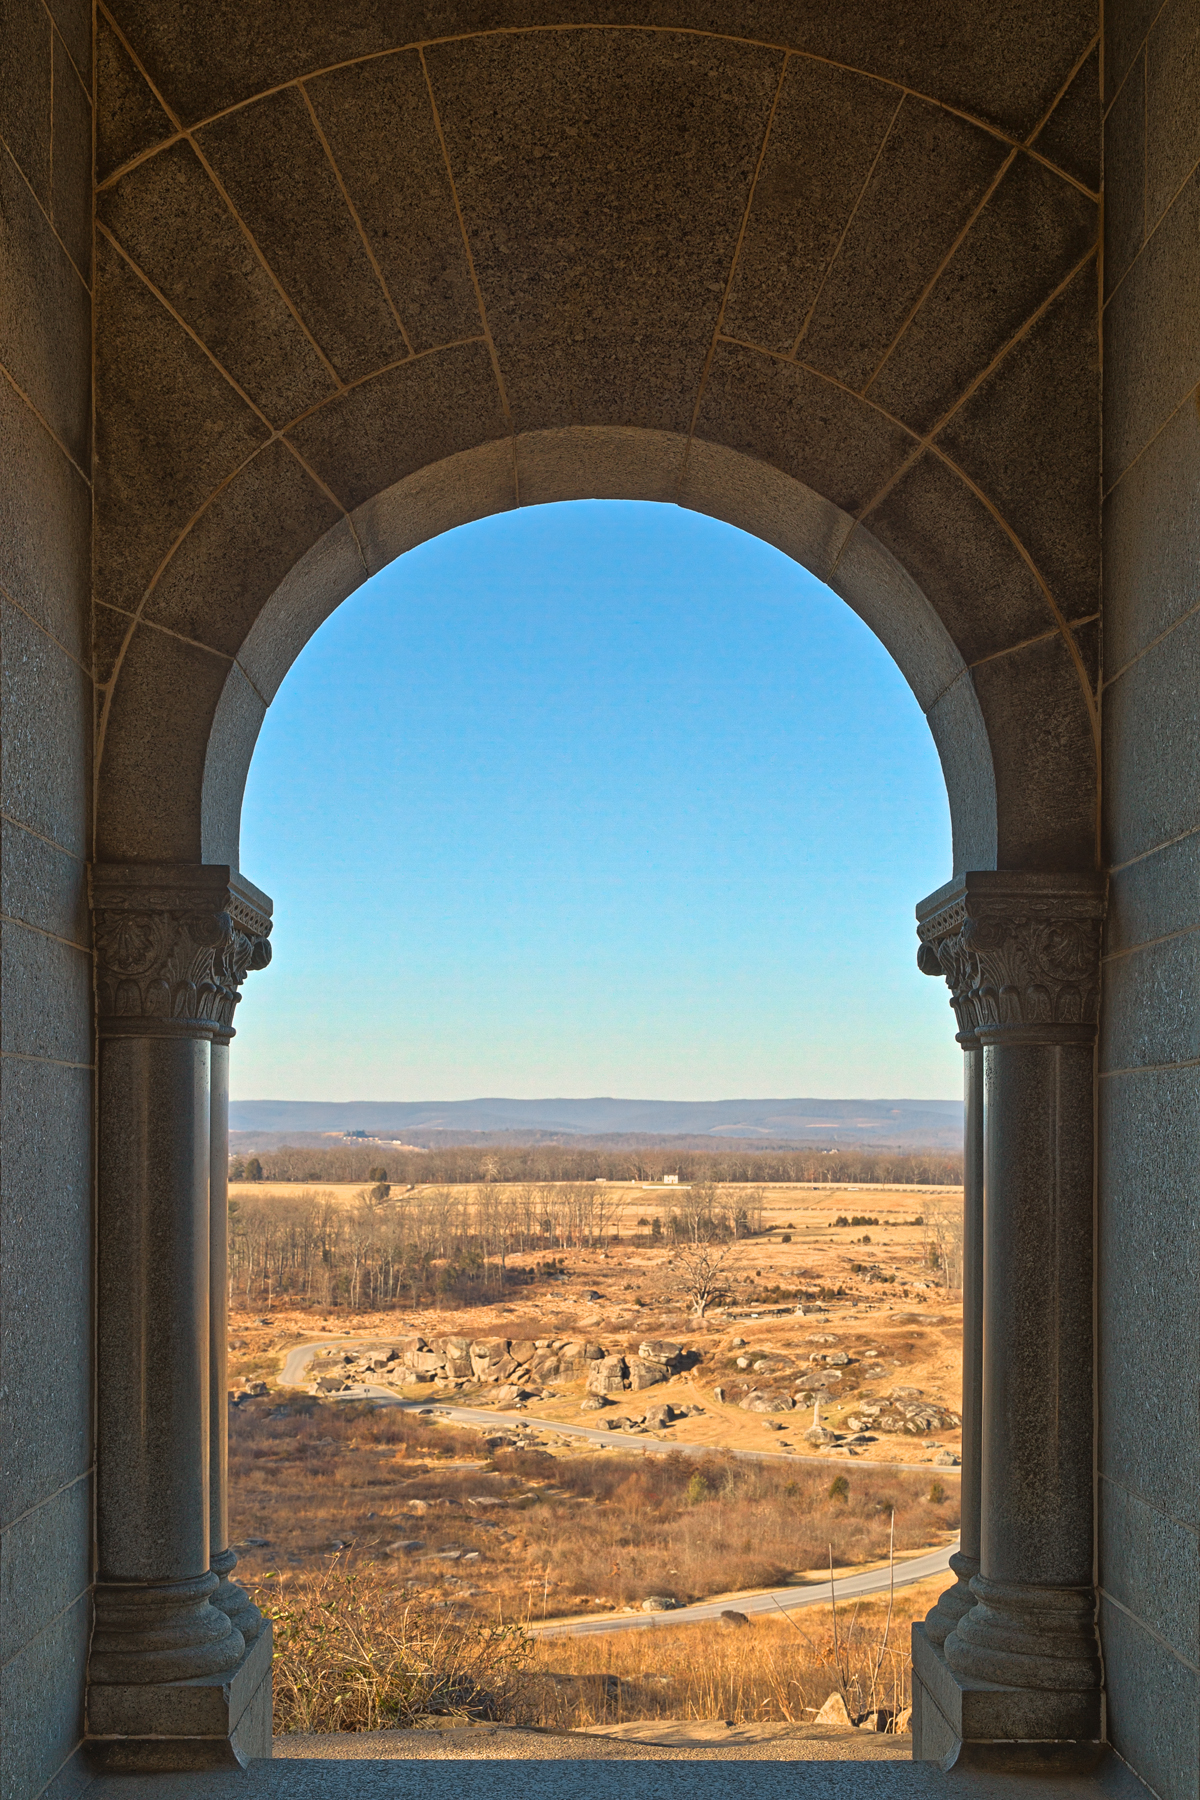 Gateway to gettysburg - hdr photo